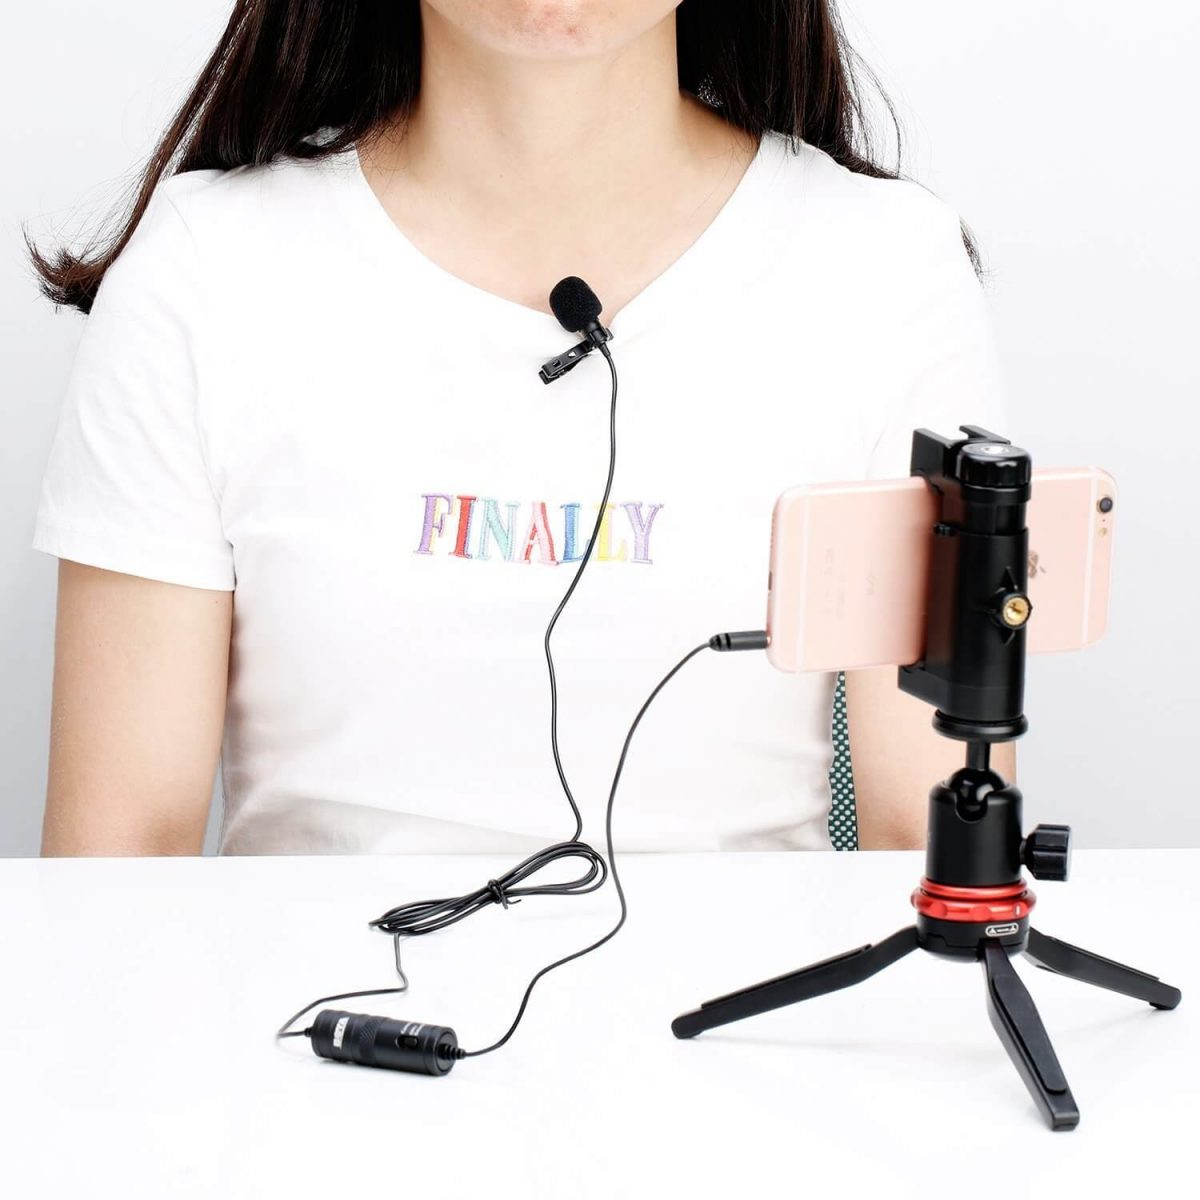 میکروفون حرفه ای BOYA مدل BY-M1 (بویا)